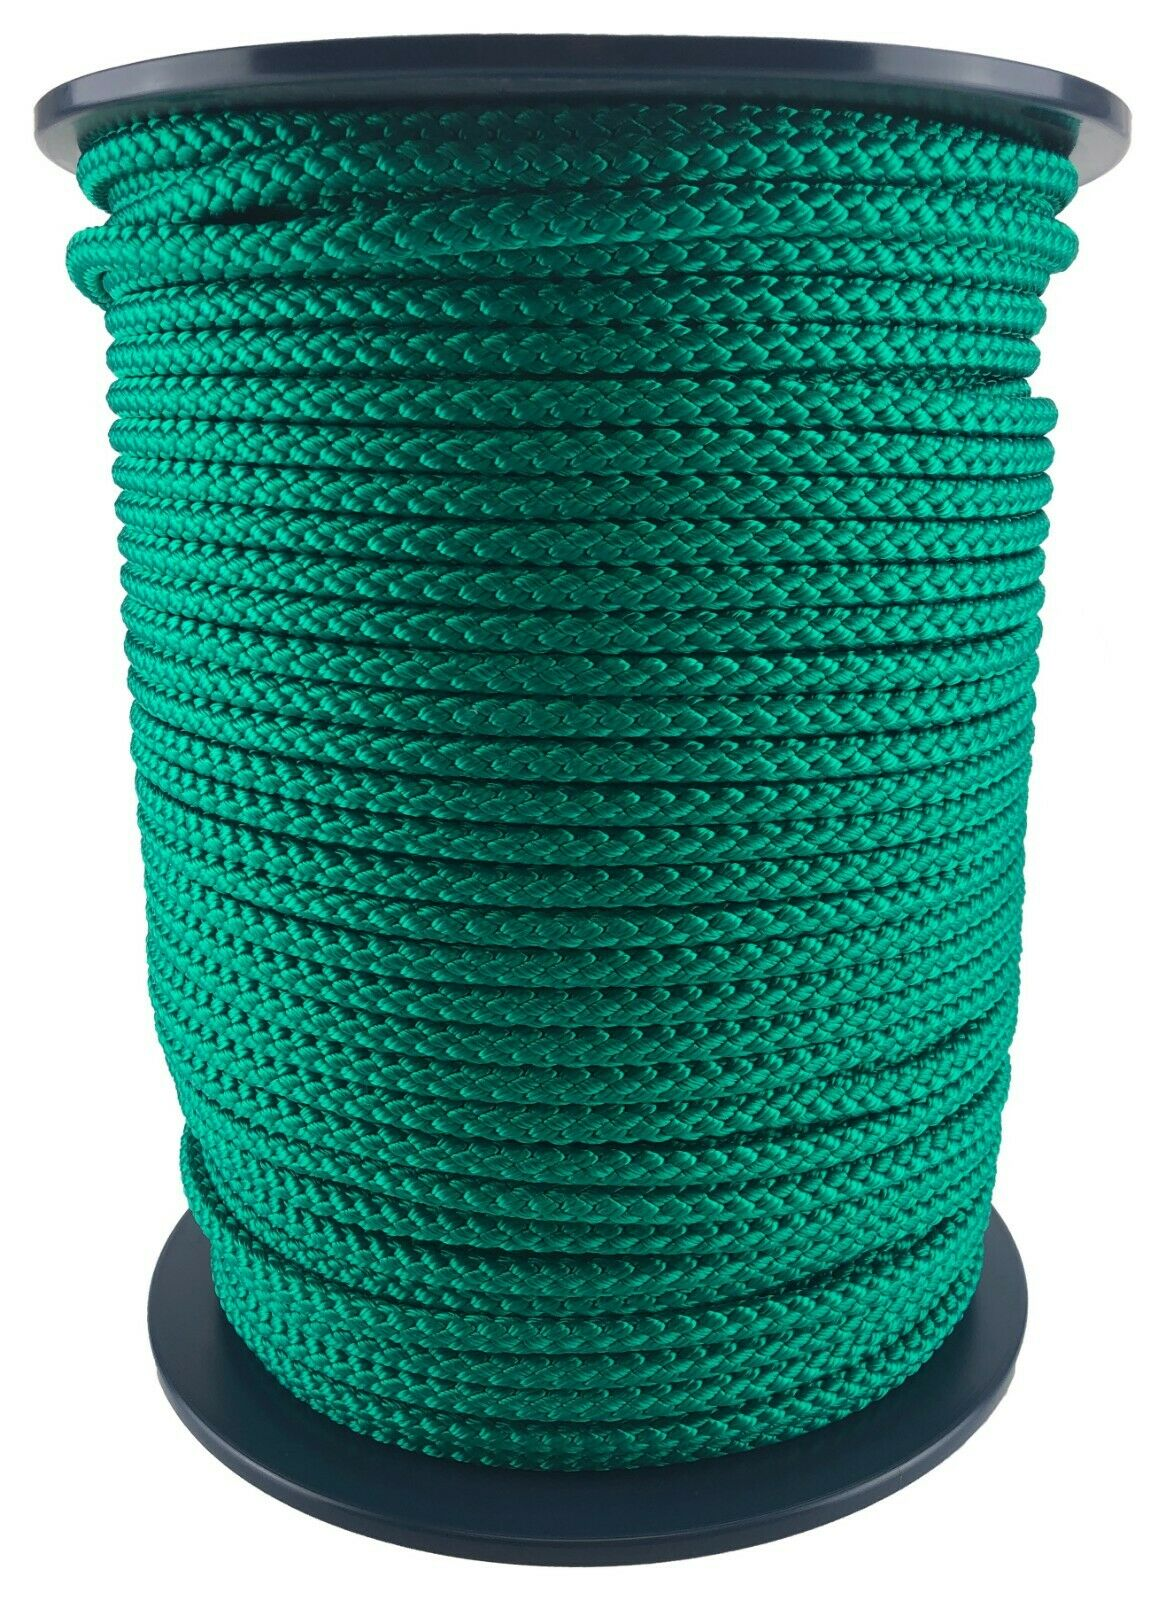 12mm Grün Geflochten Polypropylen Seil X 75 Meter Poly Line Segeln Stiefelfahren